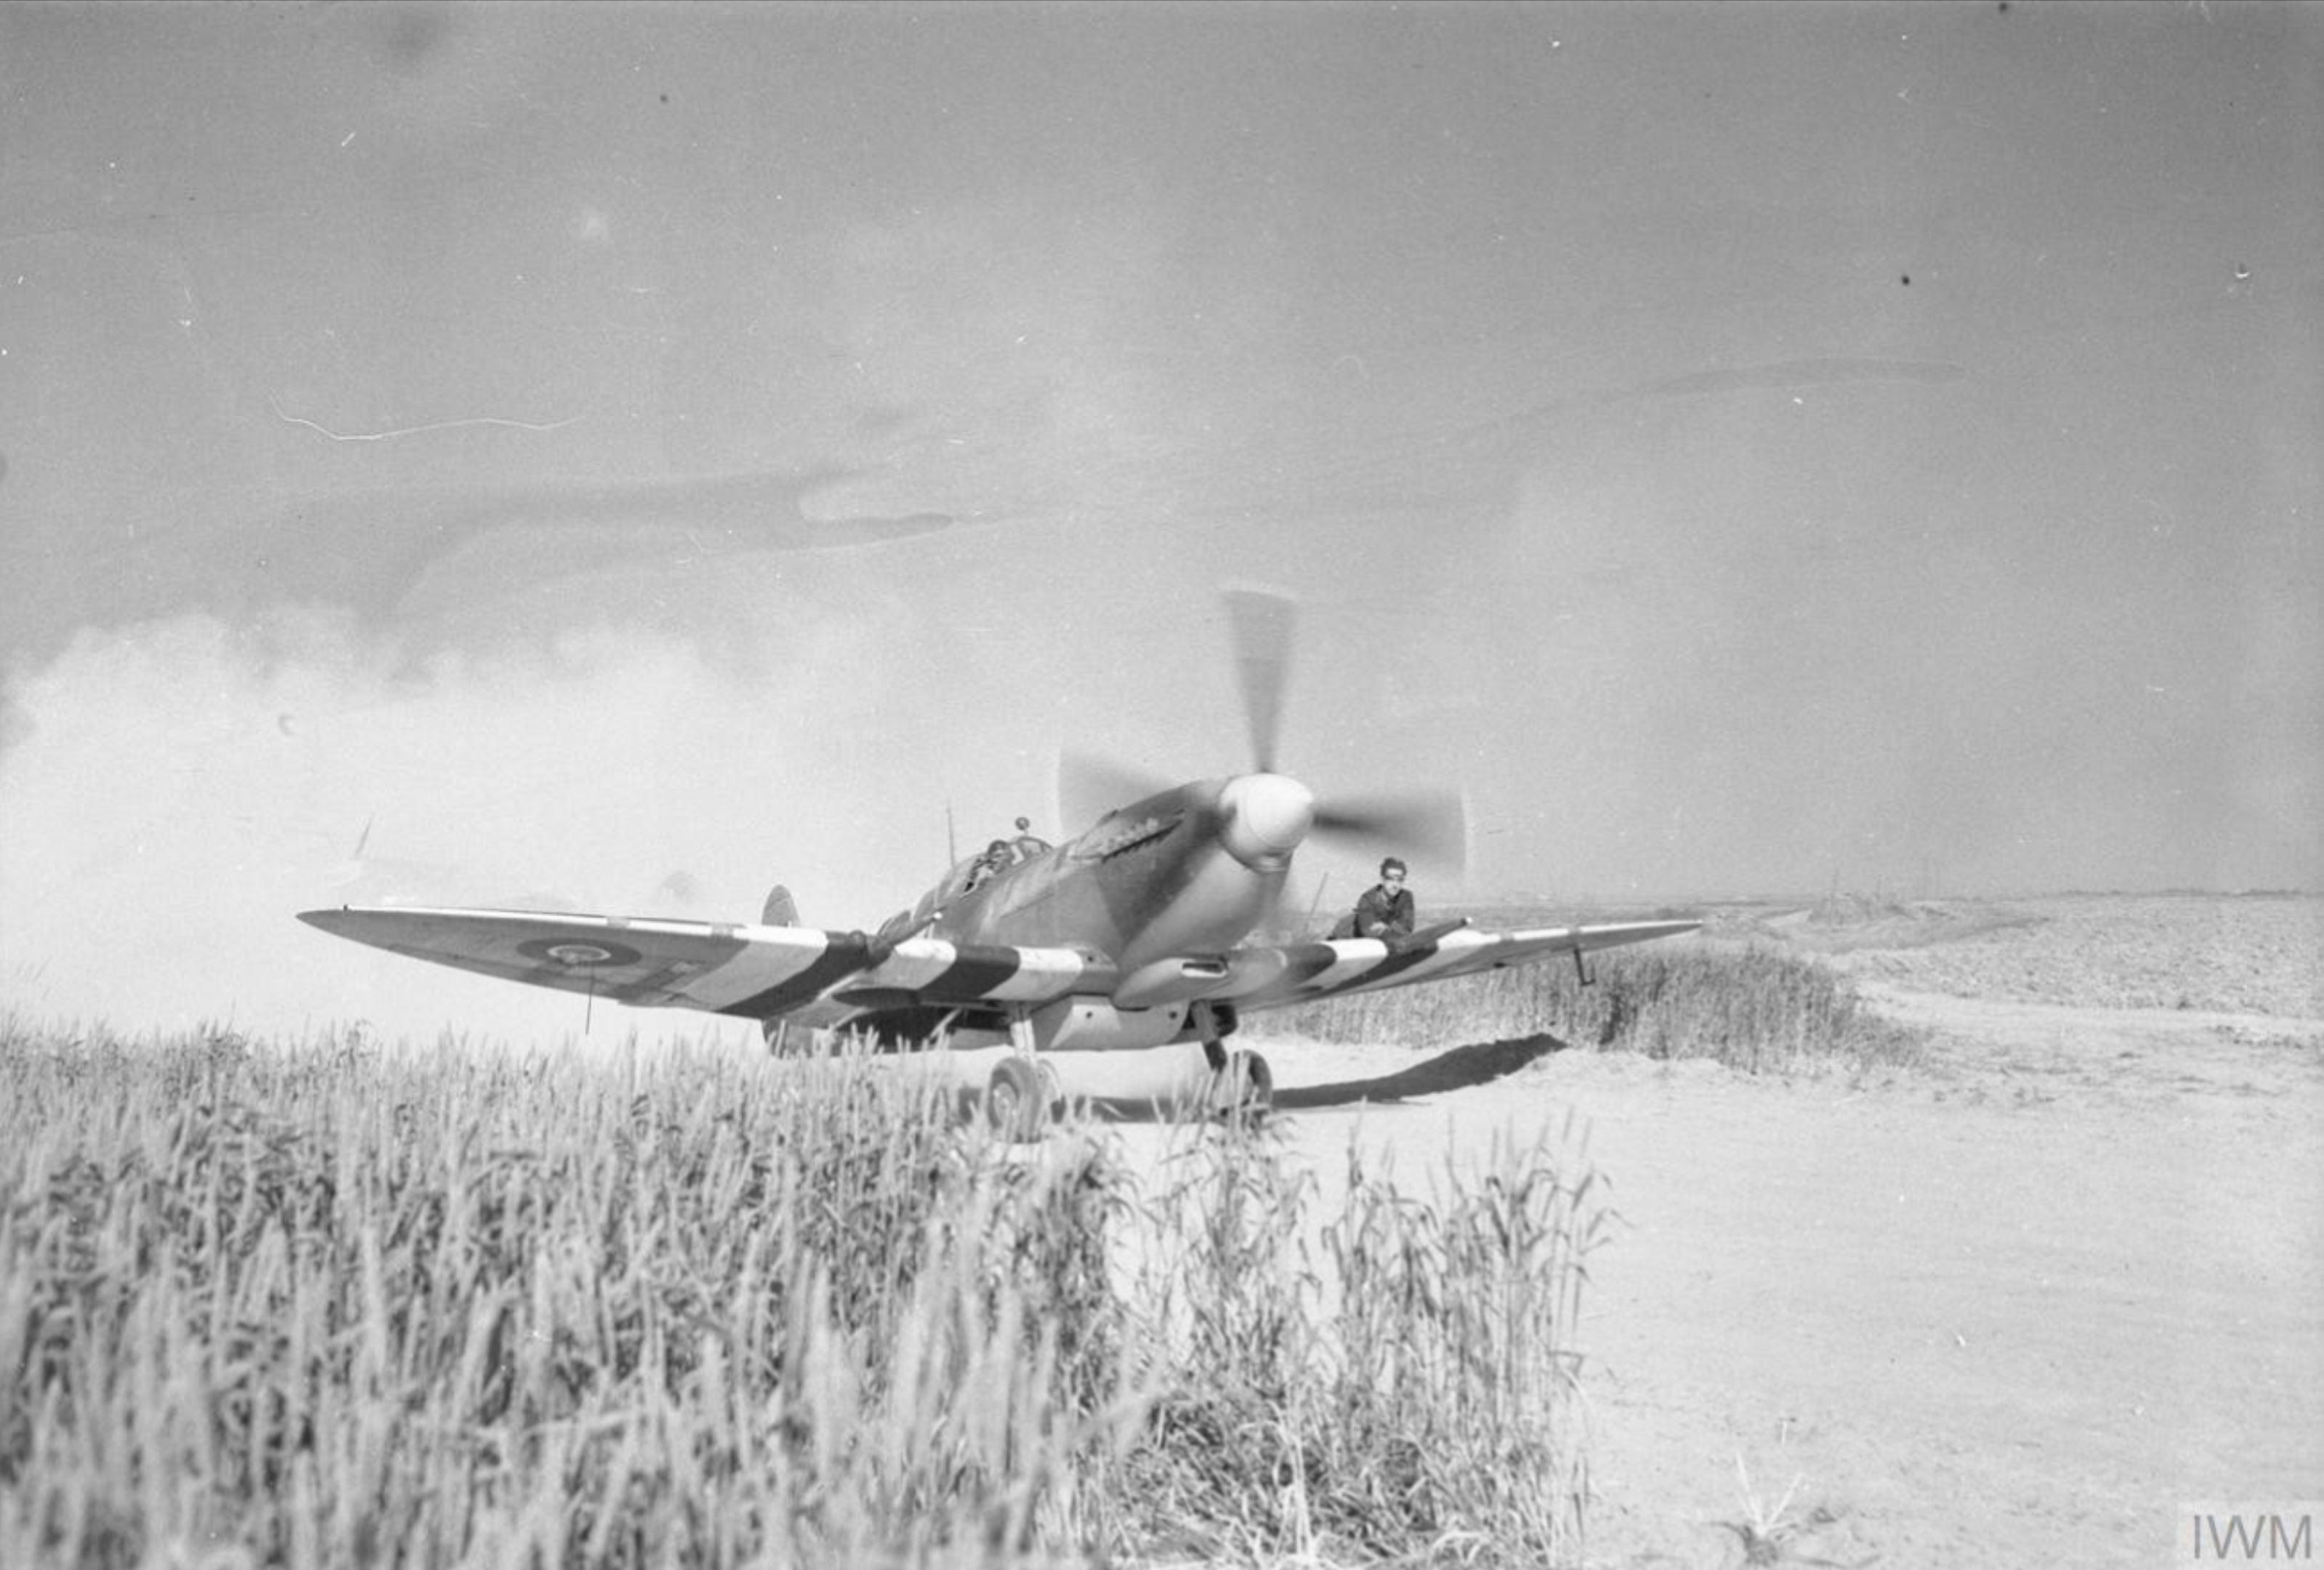 Spitfire MkIX taxing at B2 Bazenville Normandy 1944 IWM CL182A